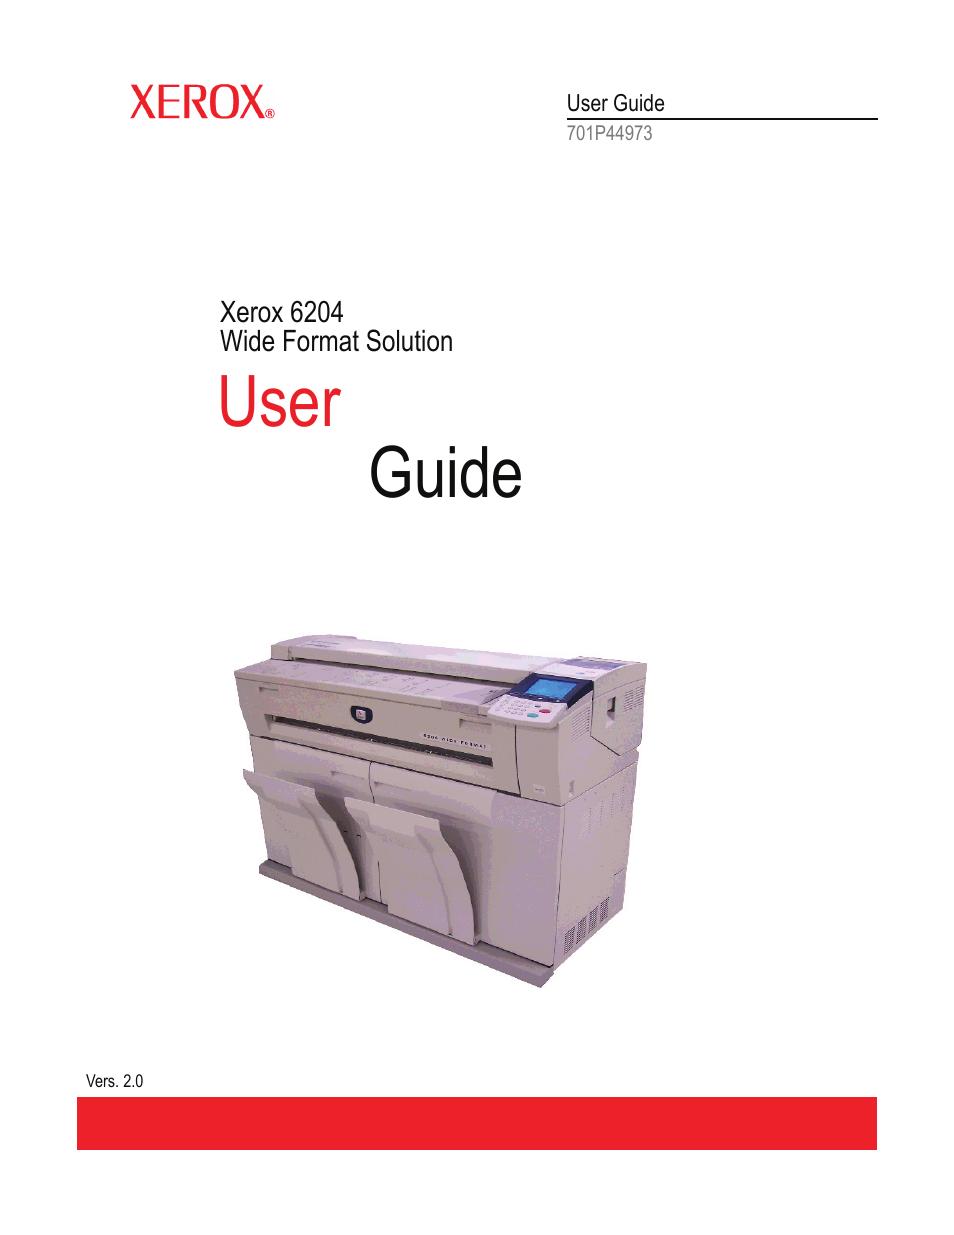 xerox 701p44973 user manual 206 pages rh manualsdir com Brochure Xerox 6204 Xerox 6204 User Guide